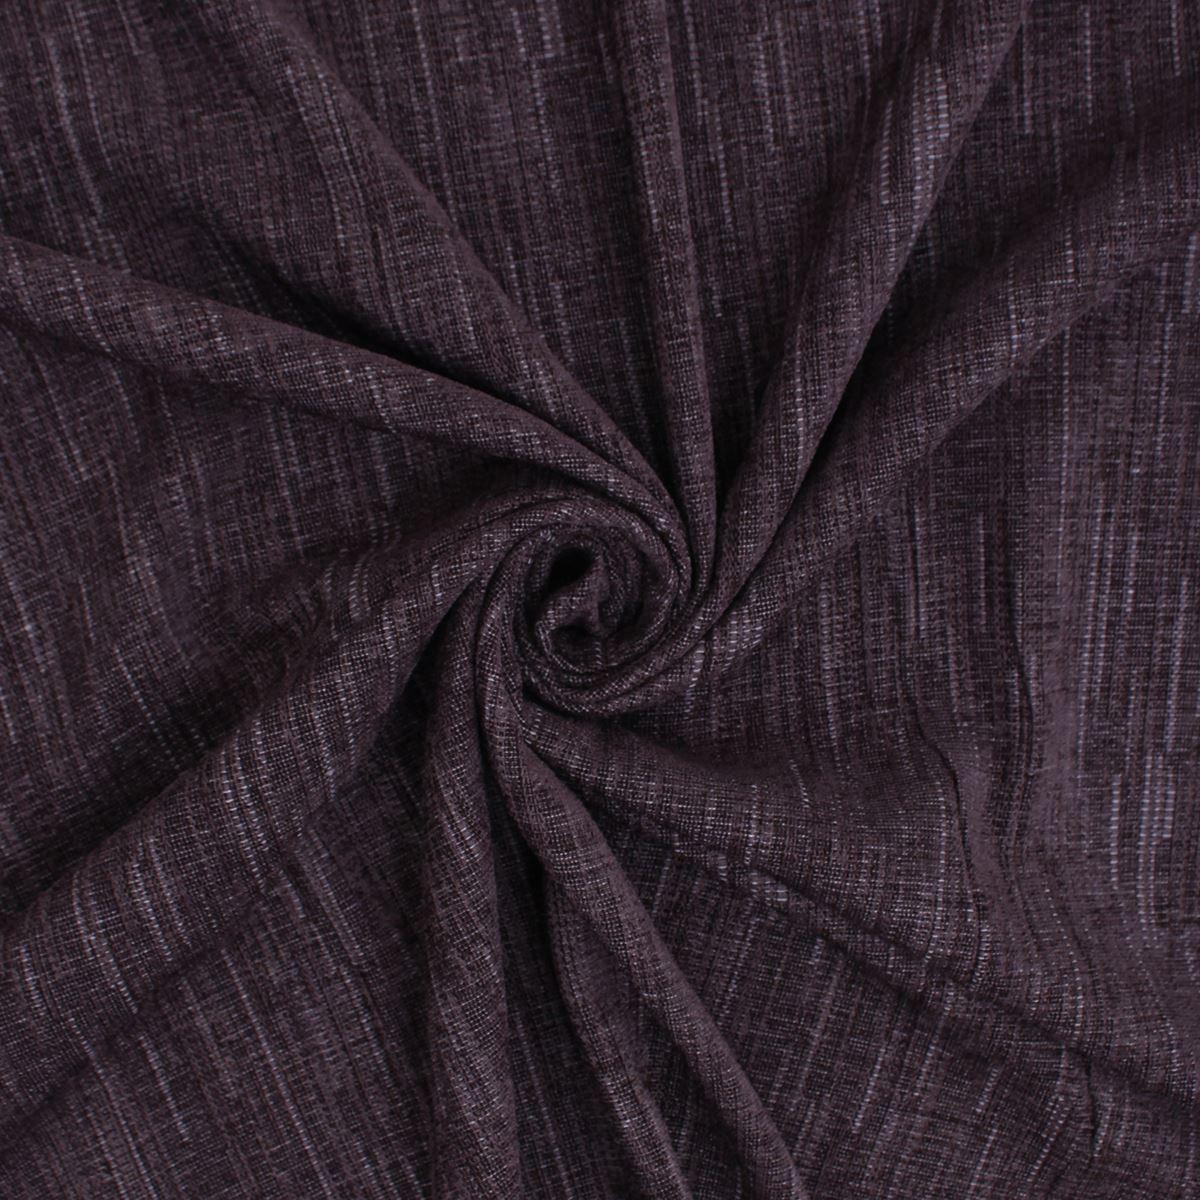 034-Chenille-034-Slubbed-Shabby-Worn-Look-Curtain-Cushion-Sofa-Upholstery-Fabric thumbnail 11